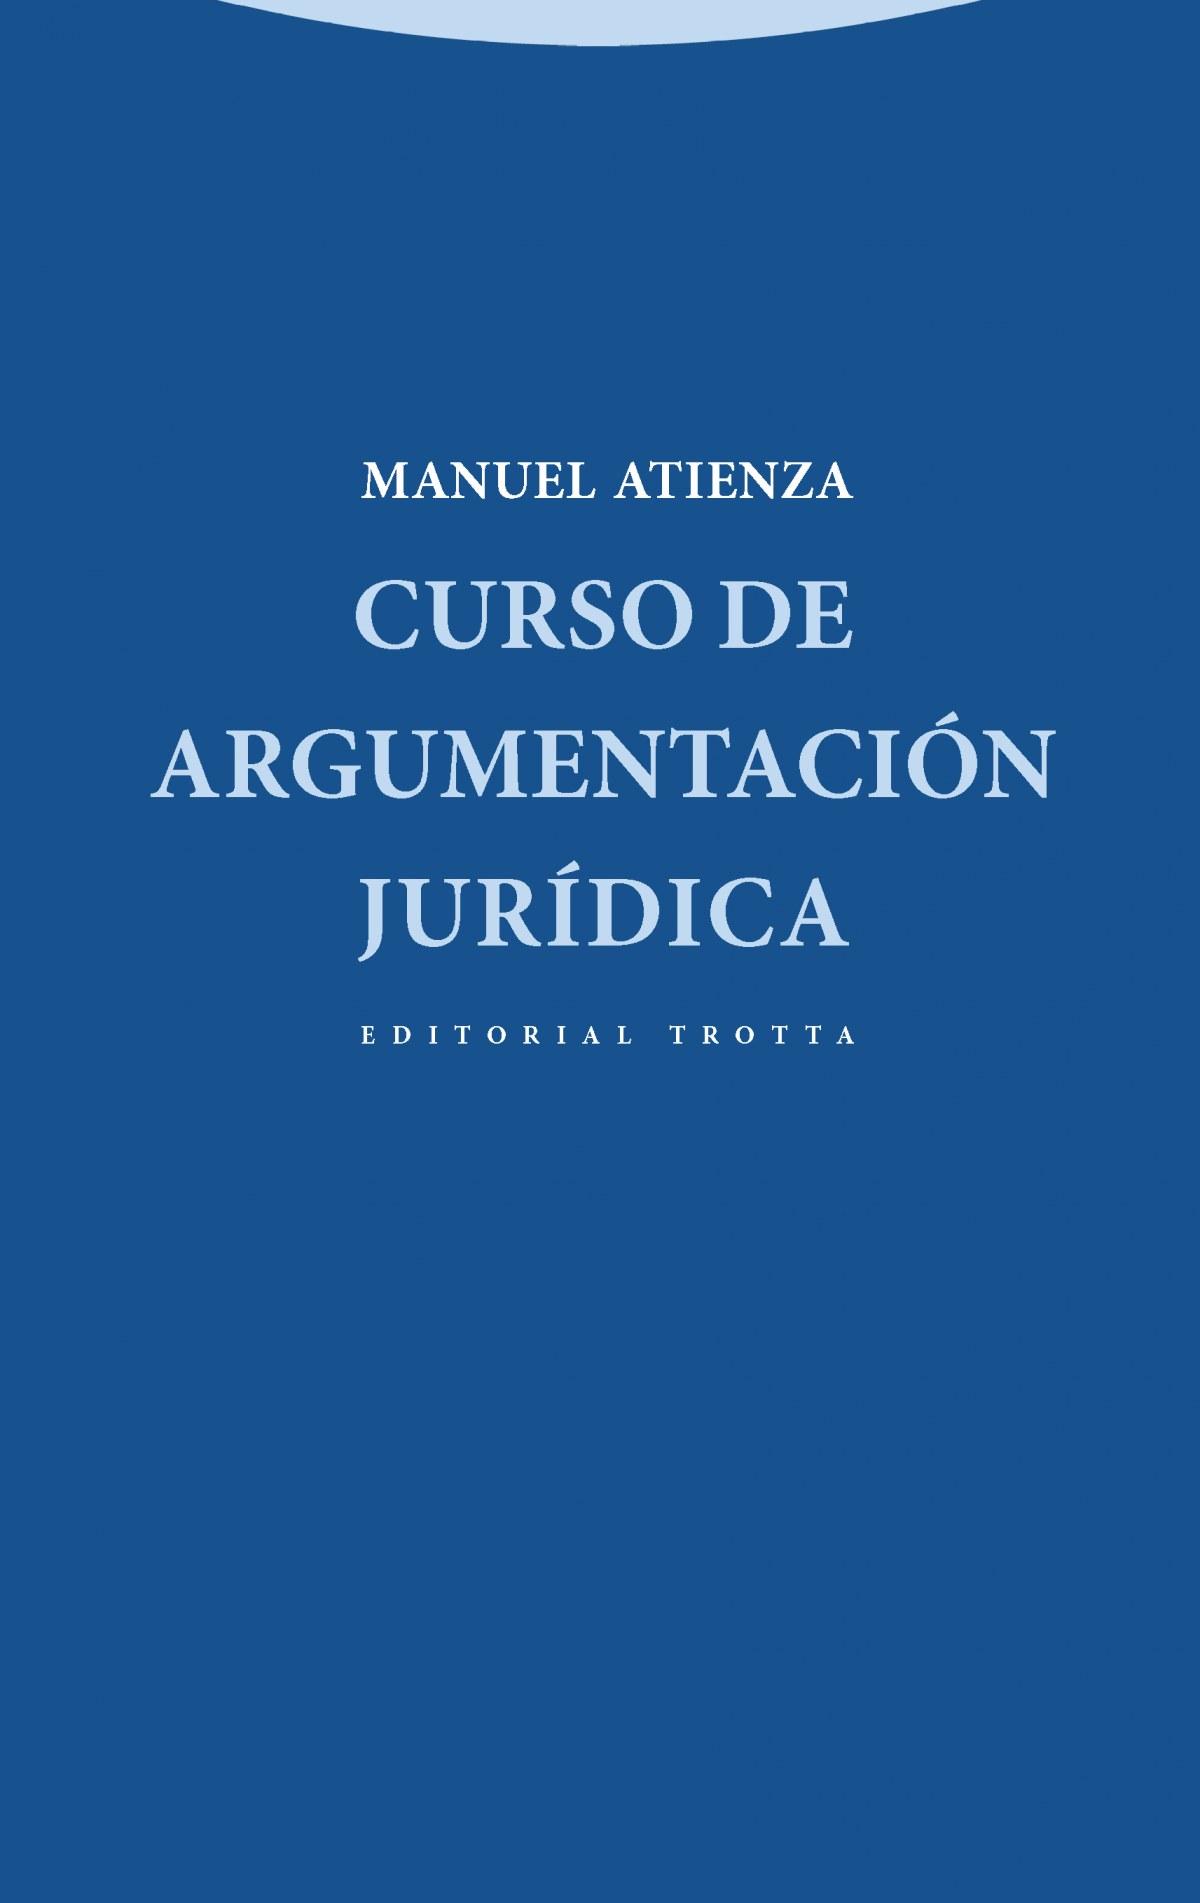 Curso de argumentacion juridica 9788498794366